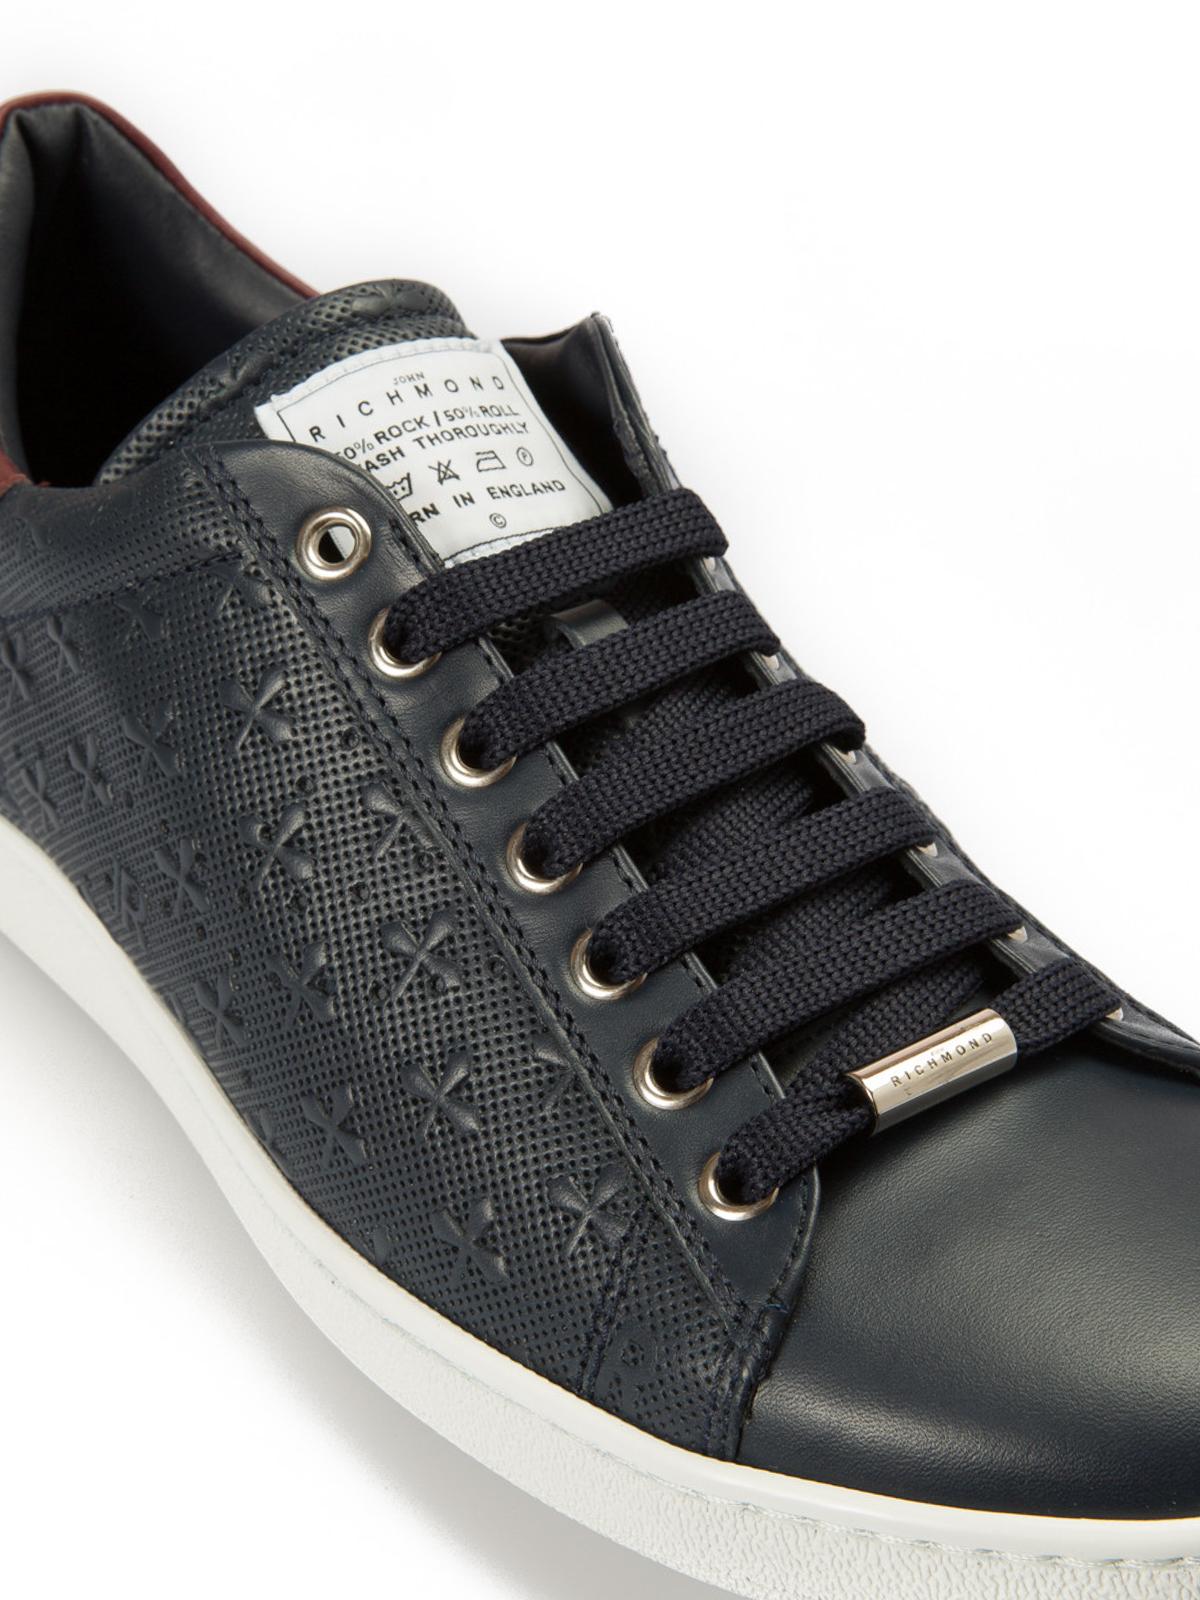 john richmond women's sneakers